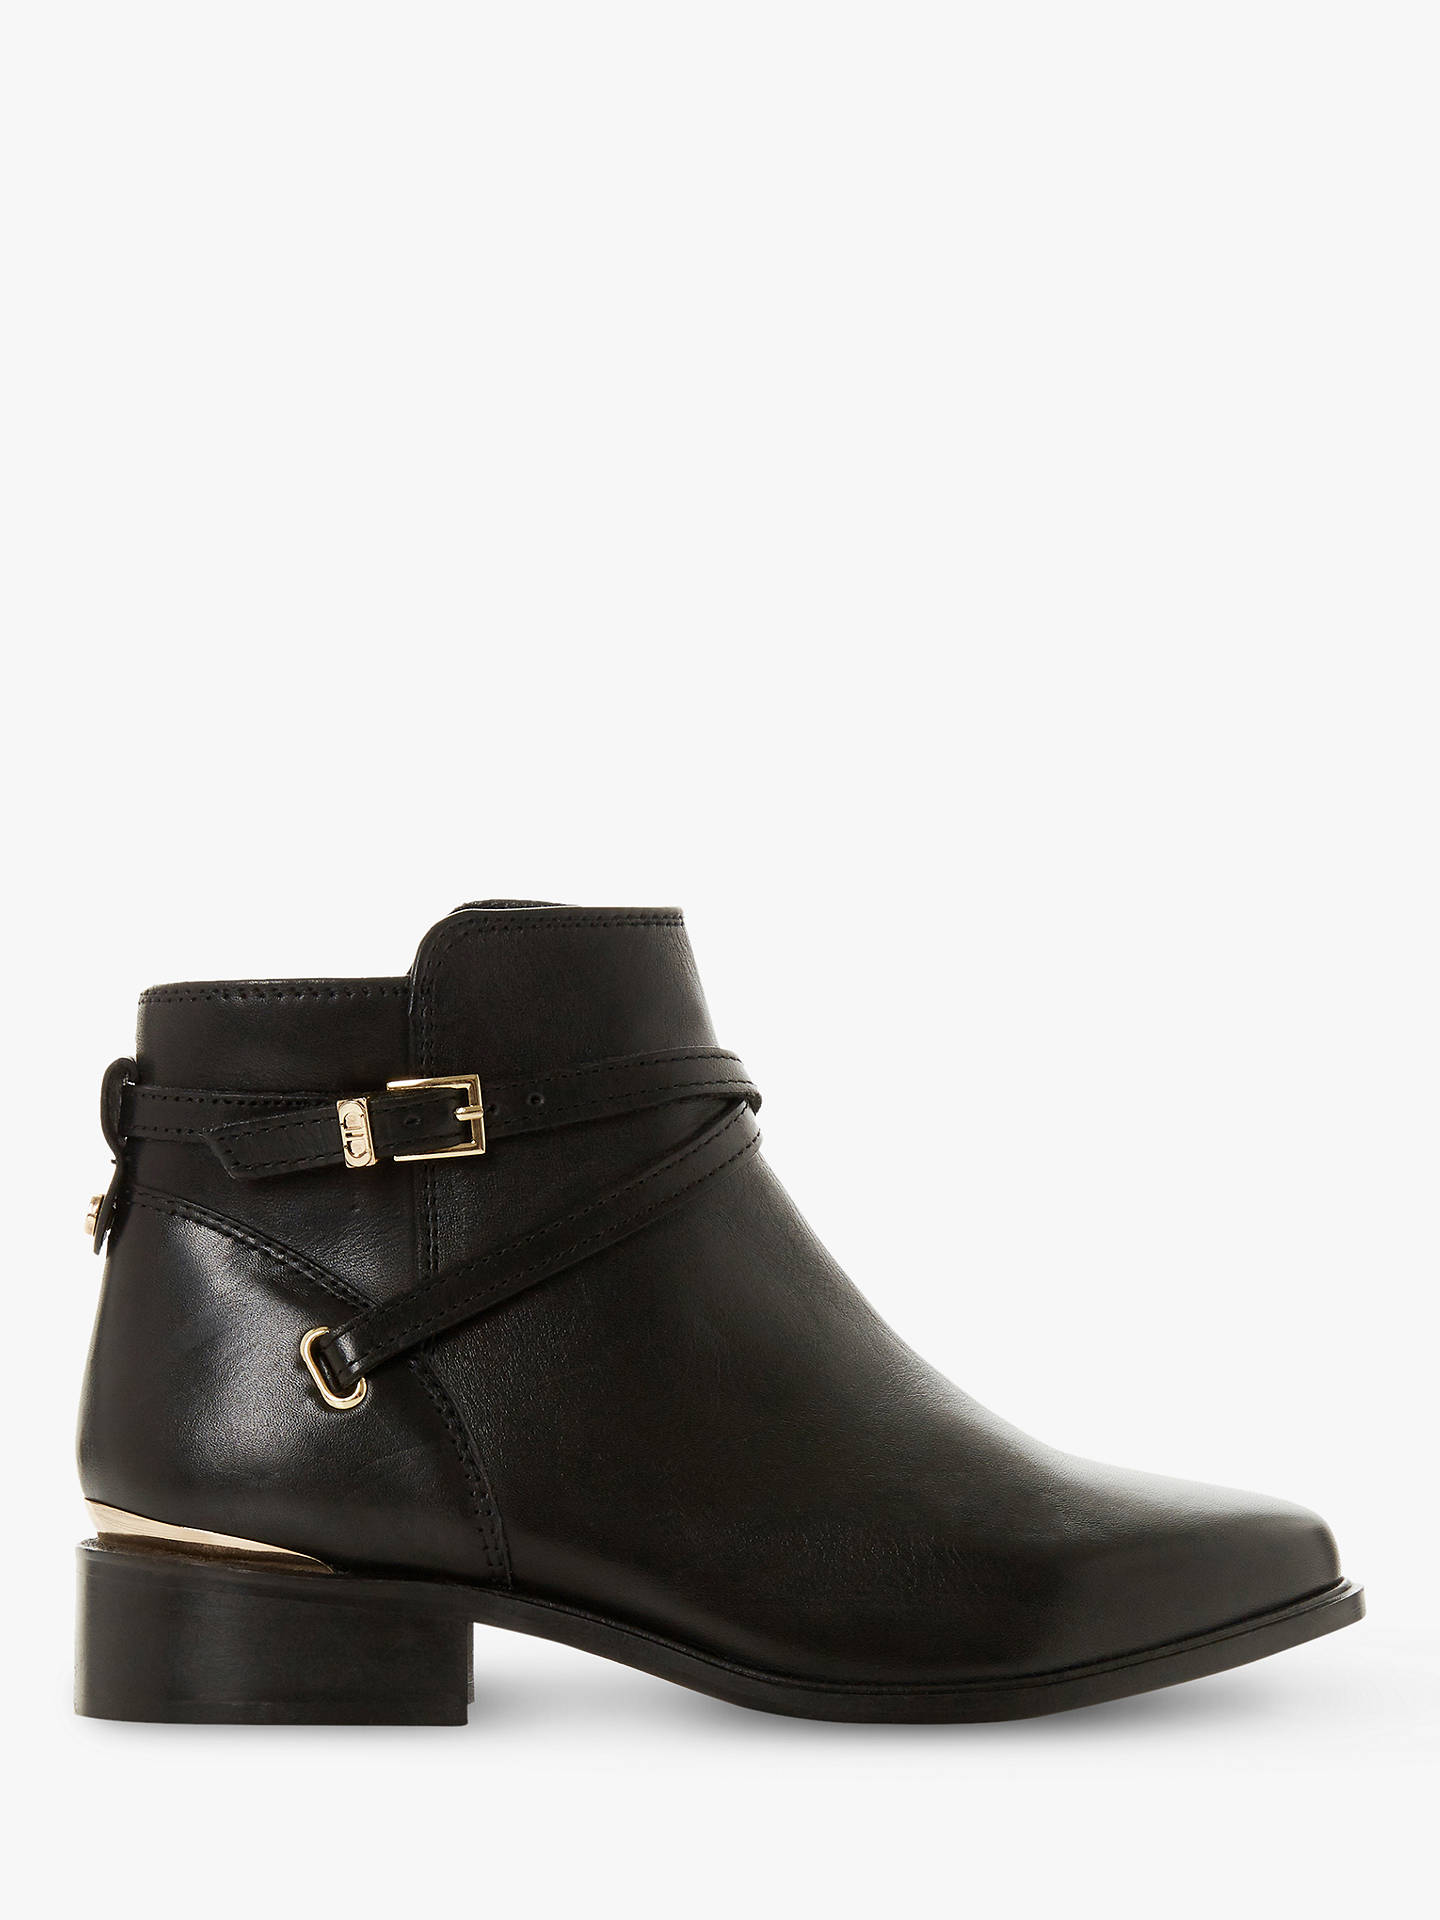 buy good big discount sale shop best sellers Dune Wide Fit Peper Leather Low Block Heel Ankle Boots, Black